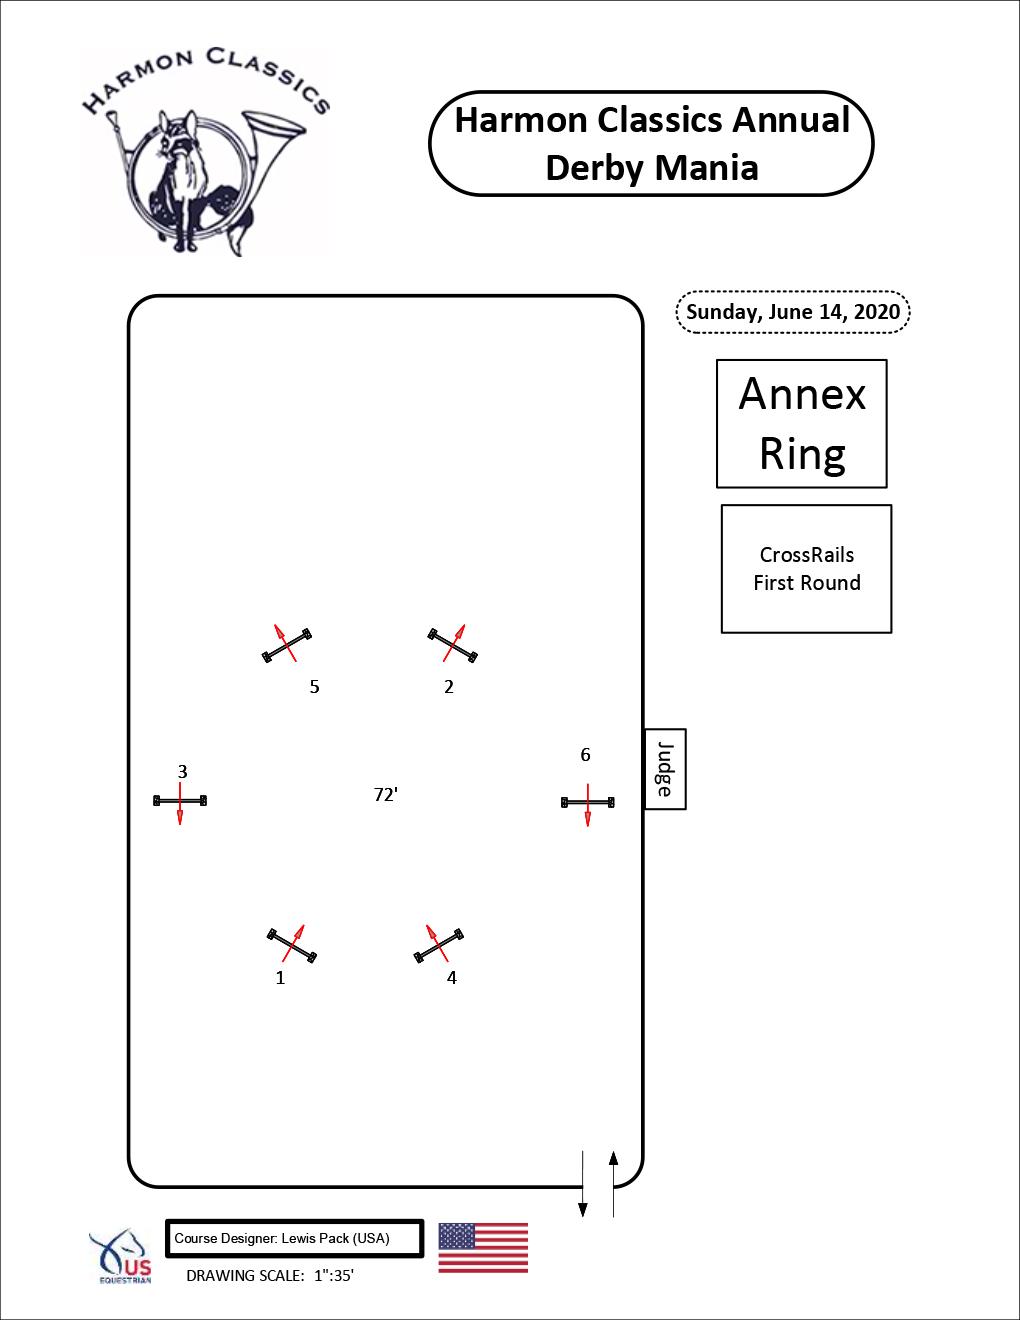 Annex-Ring-Sunday6-14-Crossrails-First-Round-Harmon-Classics-Derby-Mania